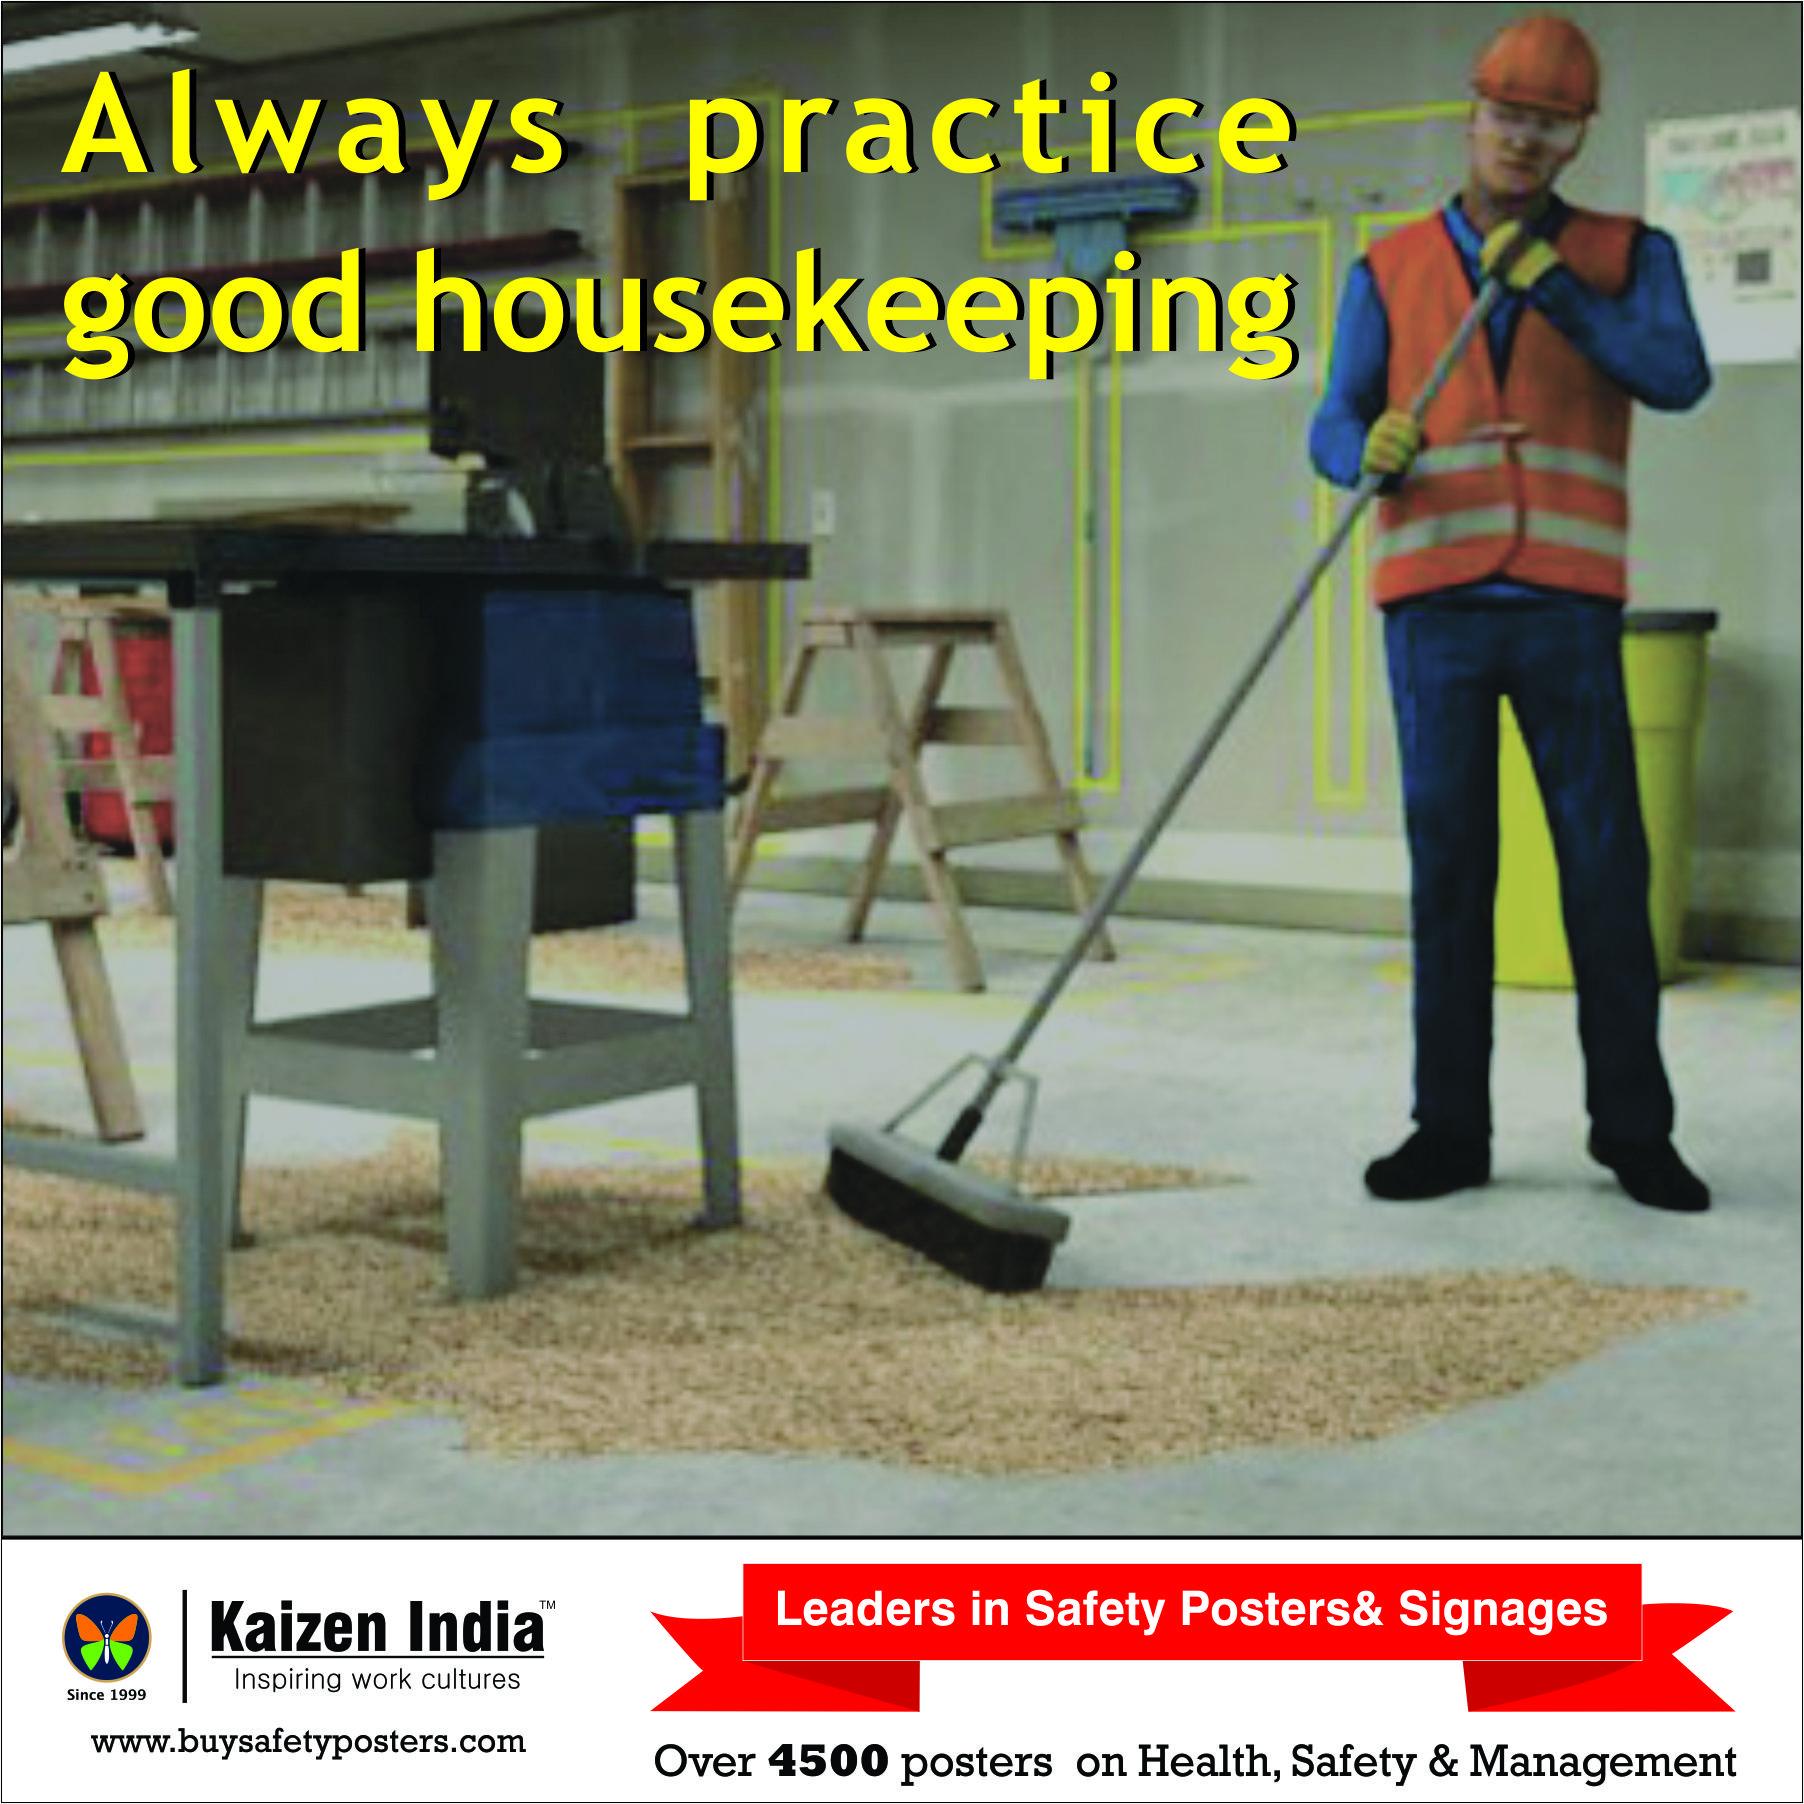 Always Practice Good Housekeeping Housekeeping Safetysign Safetyfirst Beaware Buysafetyposters Kaizeni Safety Posters Good Housekeeping Workplace Safety